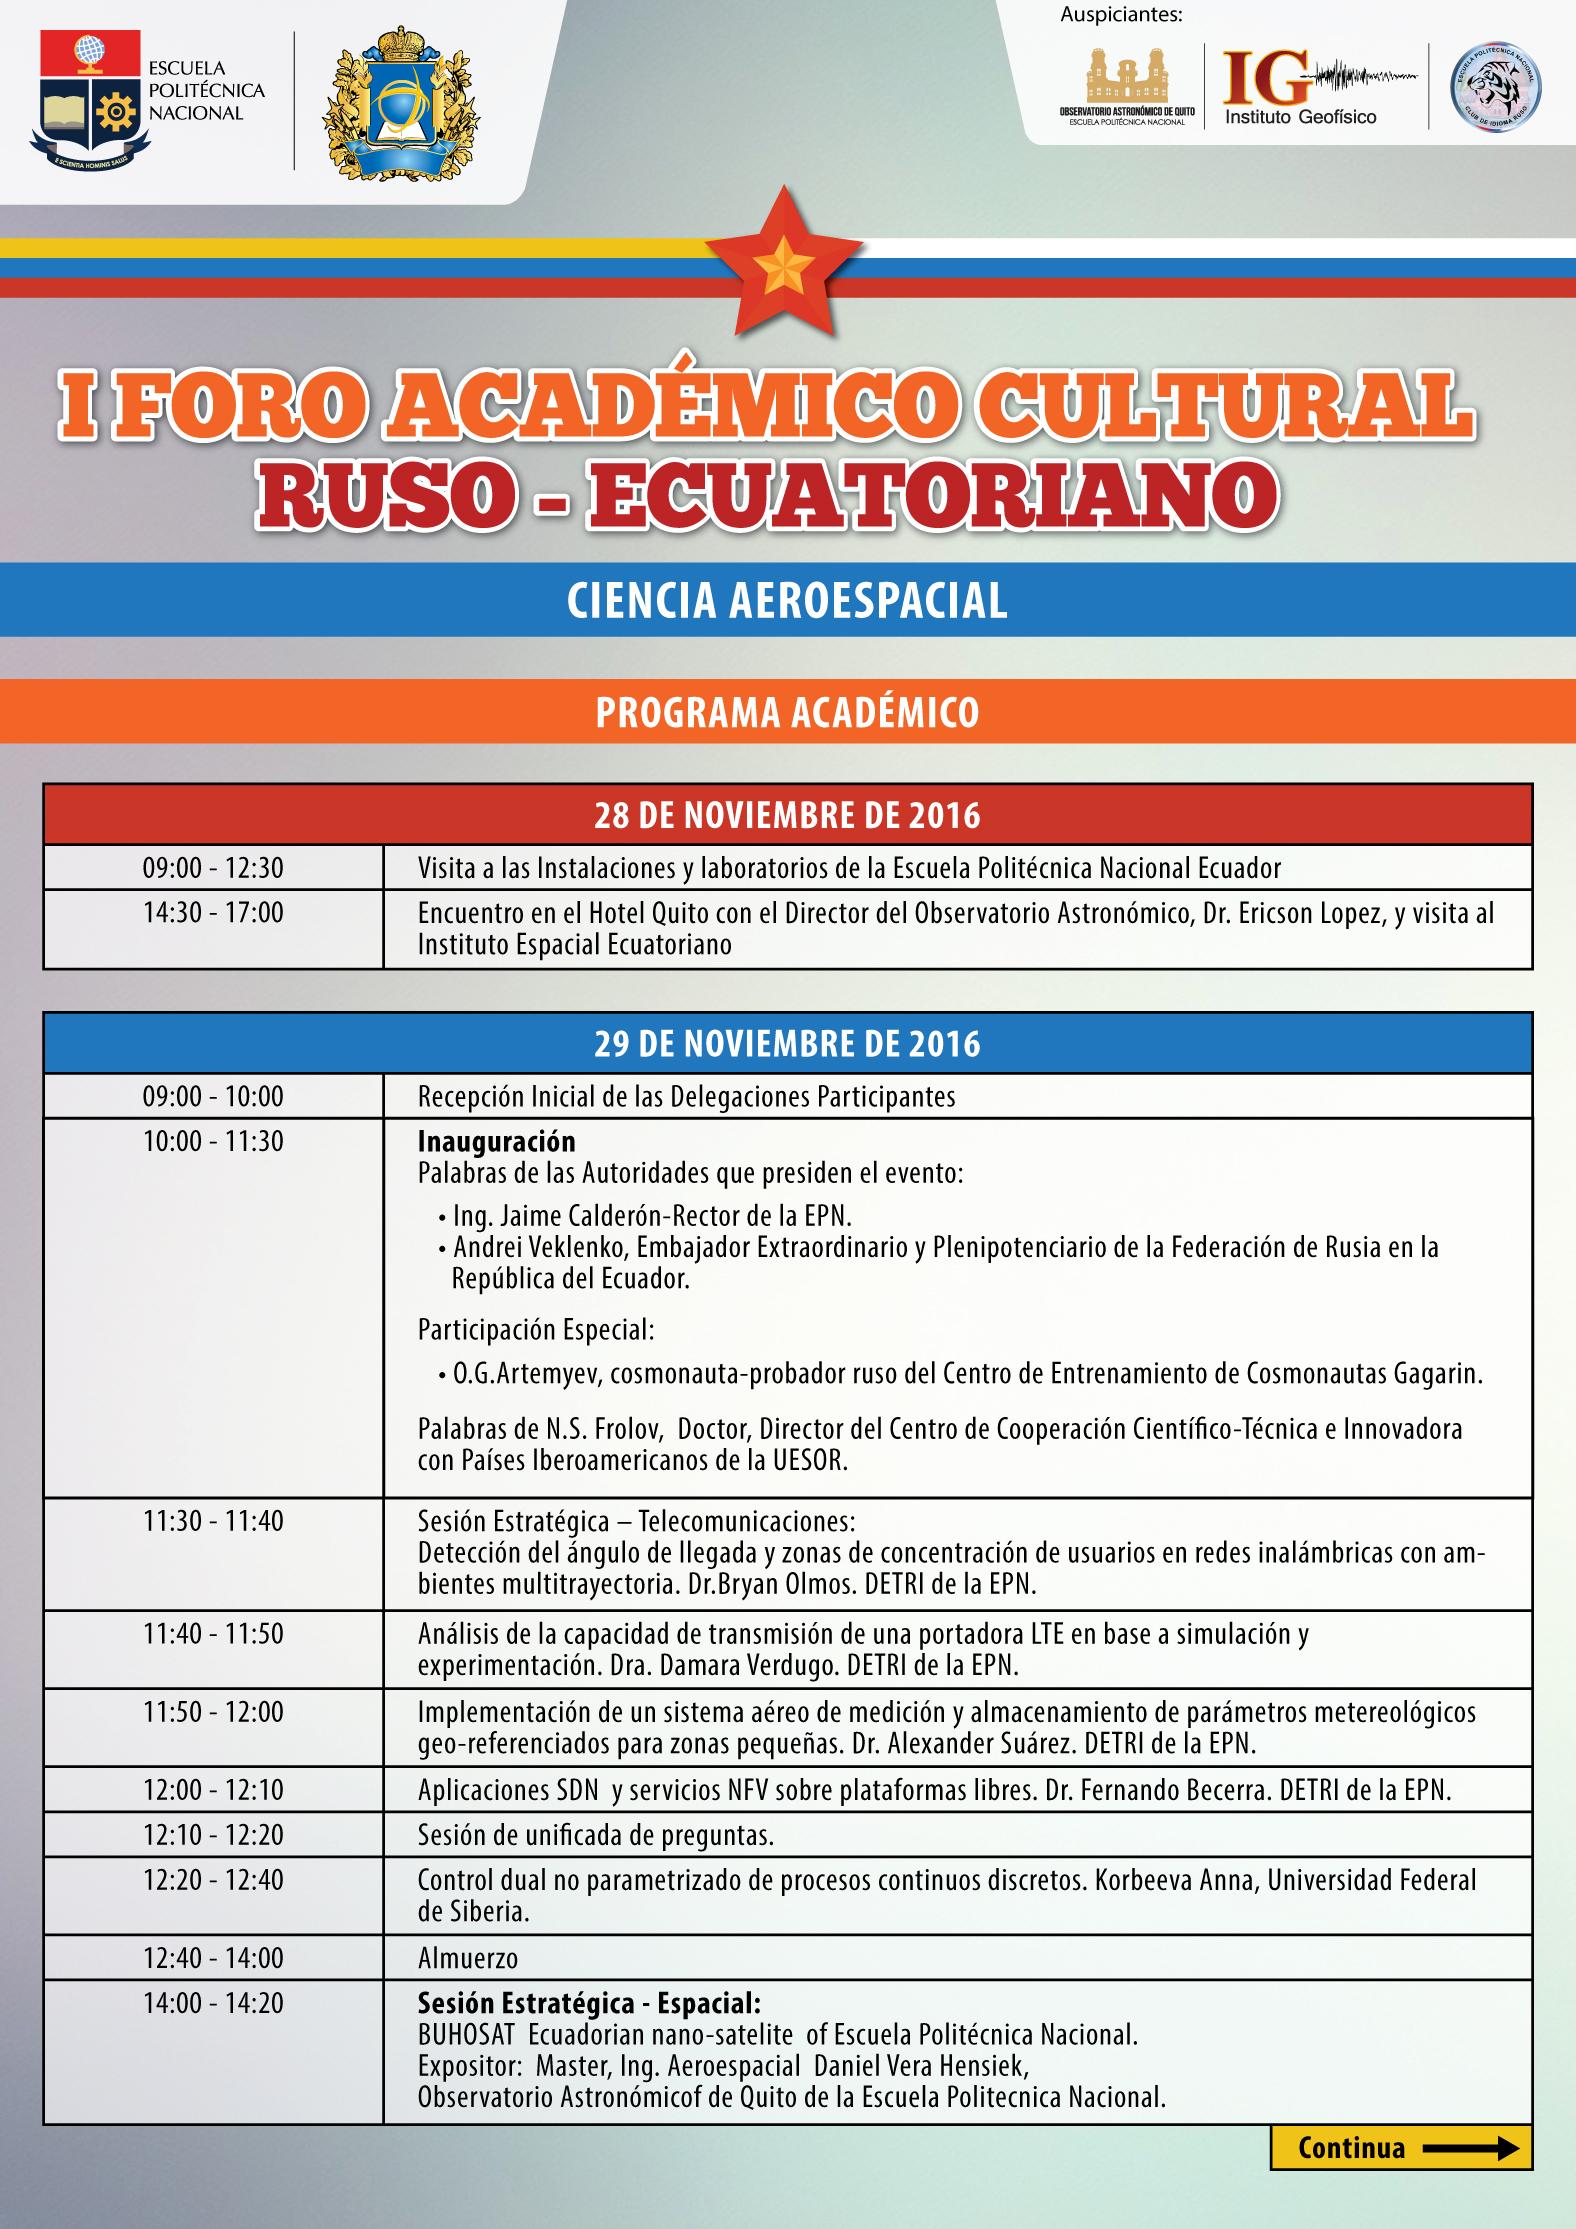 agenda_foro_rudia_ecuador_gr1